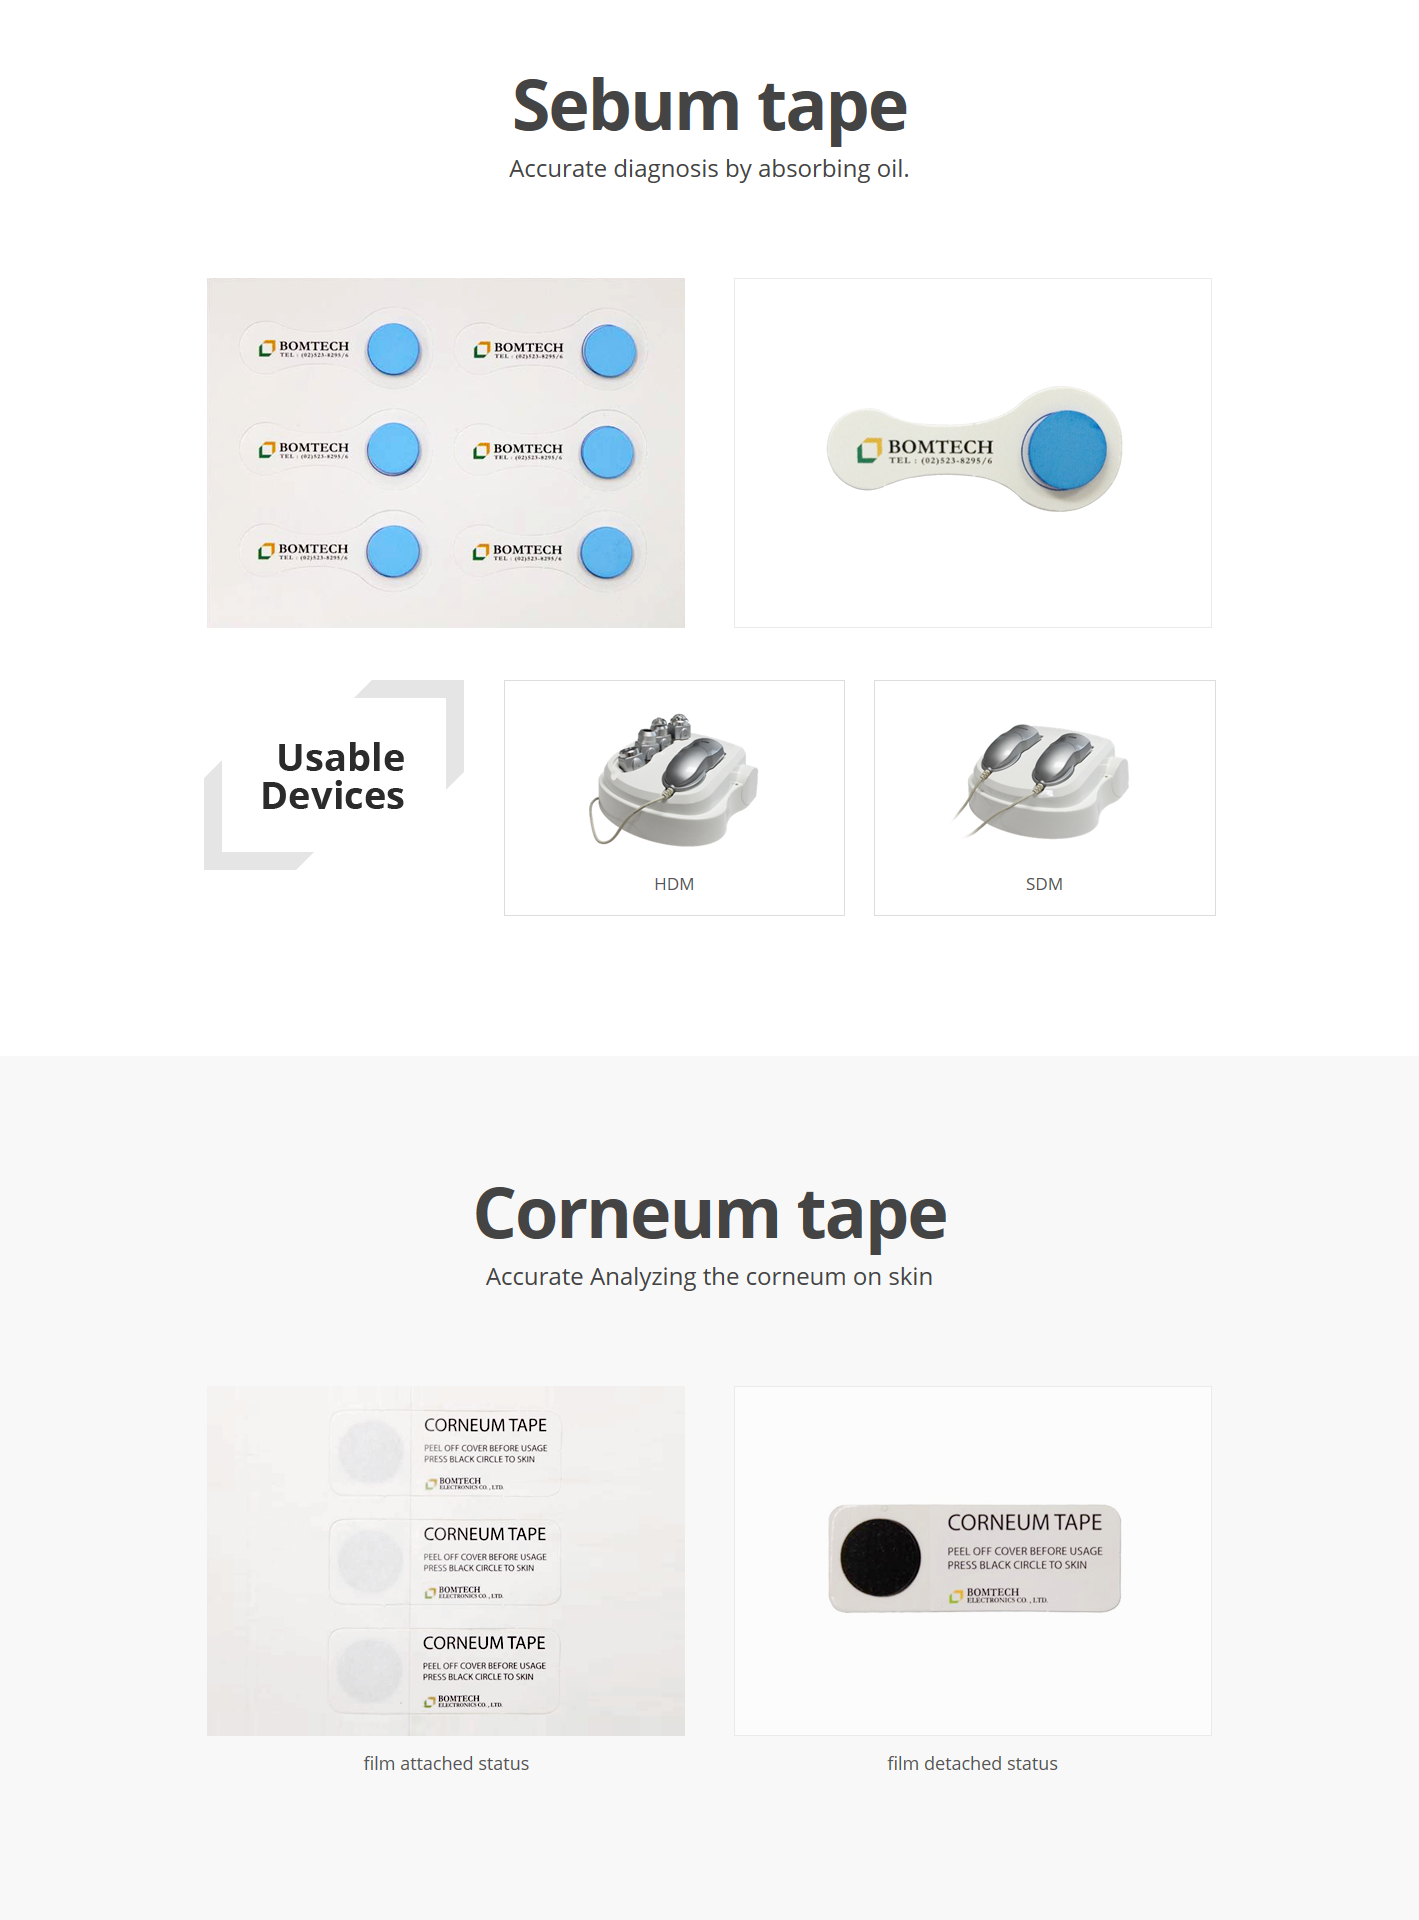 Bomtech Sebum tape / Corneum tape